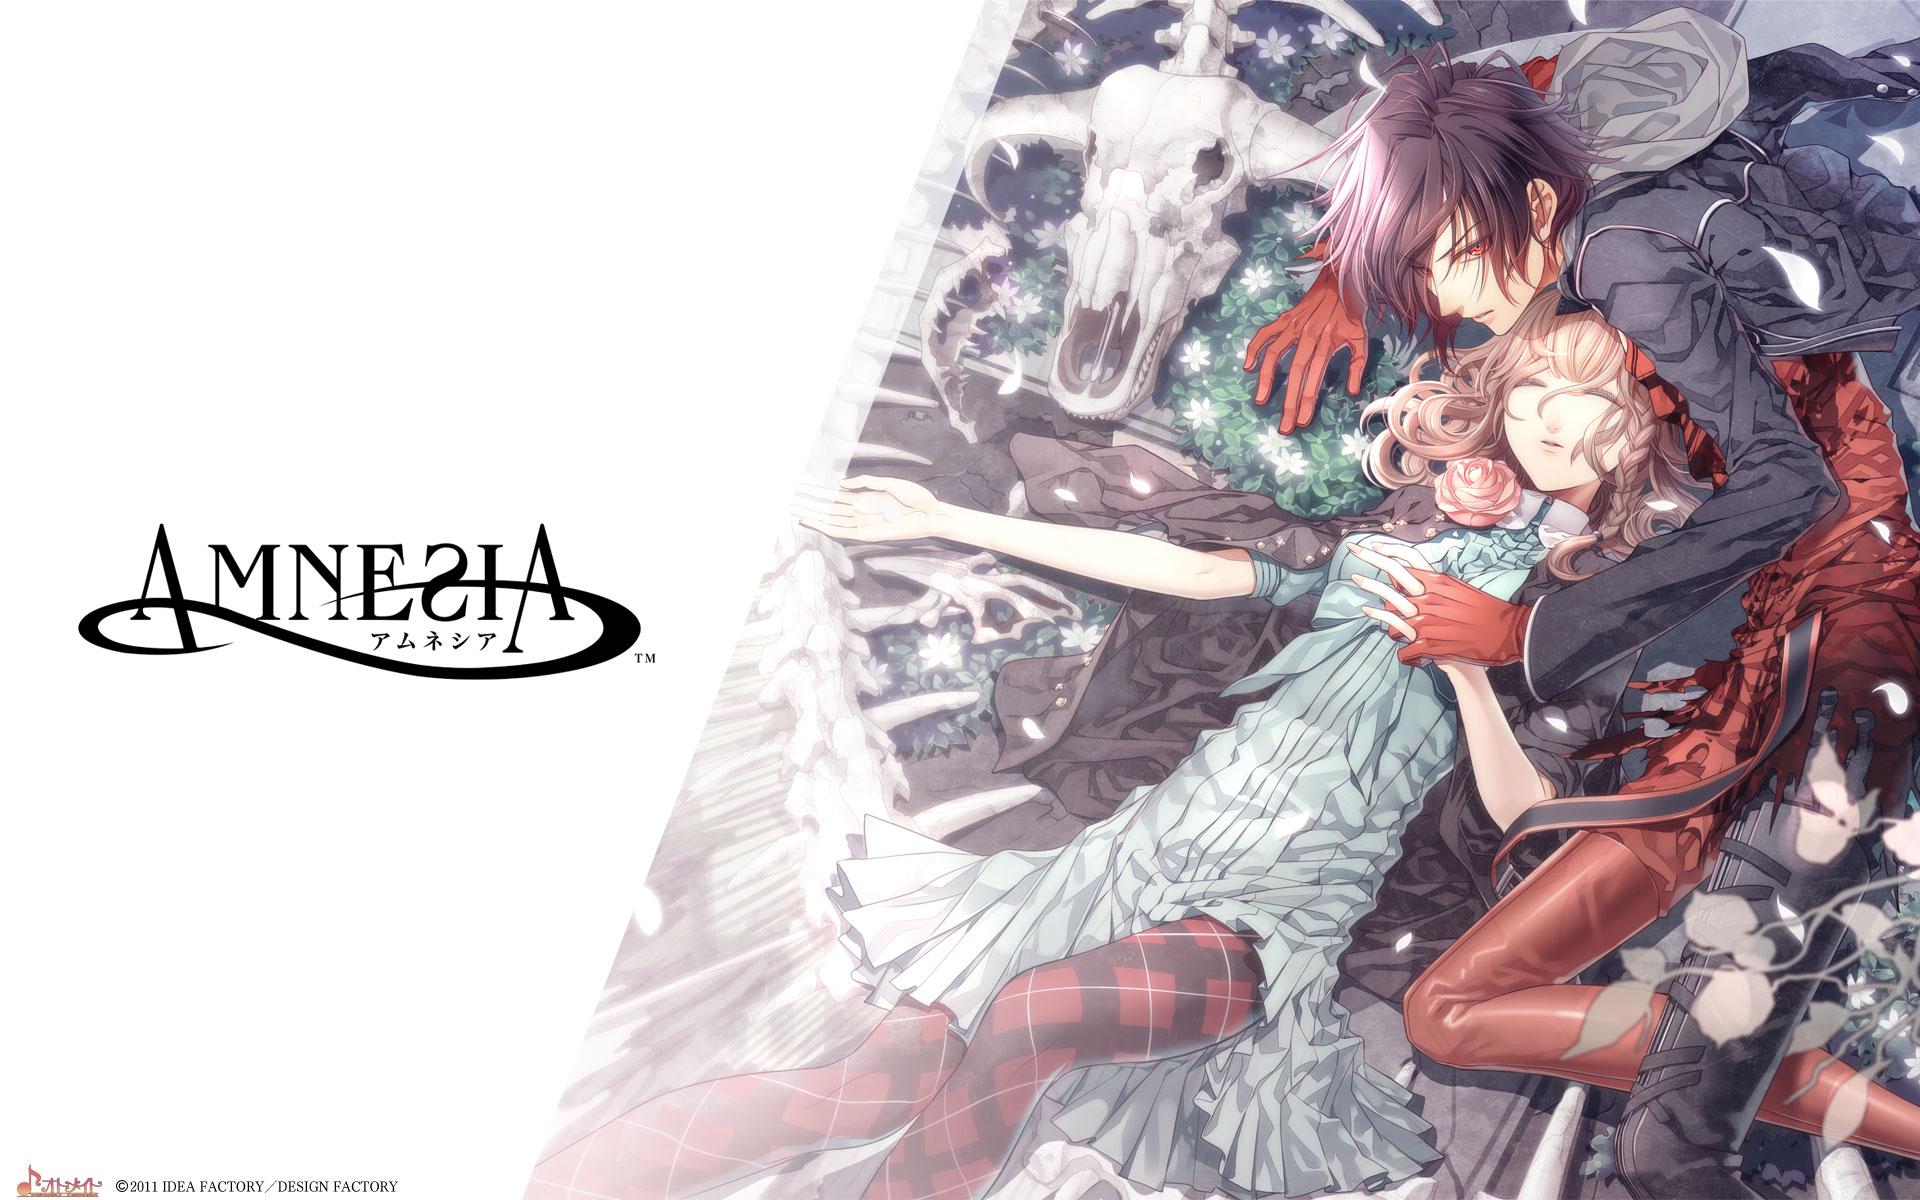 Tags: Wallpaper, IDEA FACTORY, Hanamura Mai, Official Art, AMNESIA, Shin (AMNESIA), Heroine (AMNESIA)